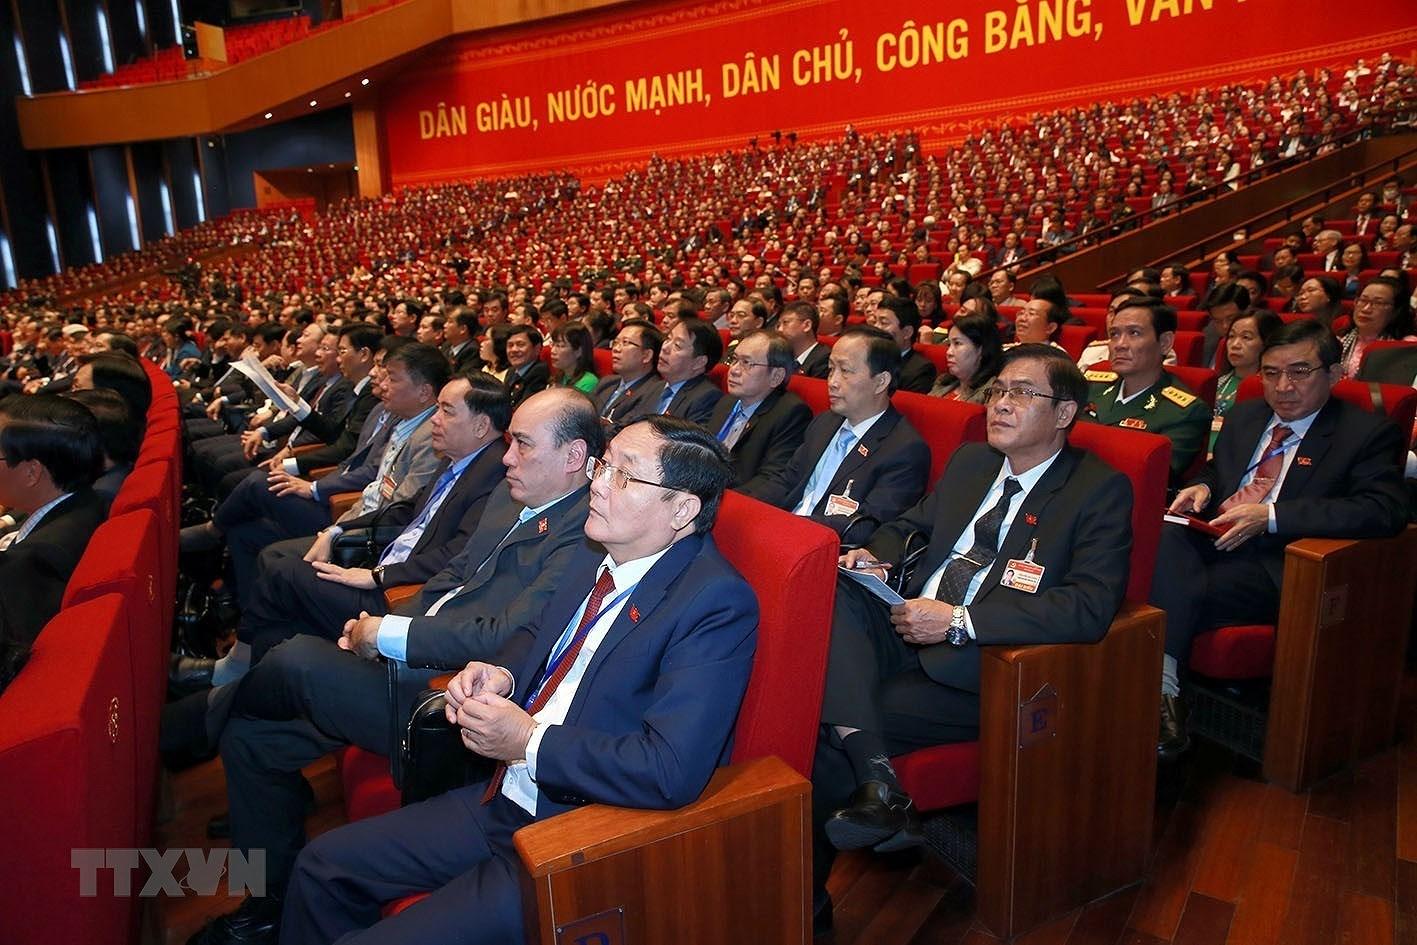 [Photo] Quang canh phien thao luan cac van kien Dai hoi XIII cua Dang hinh anh 22